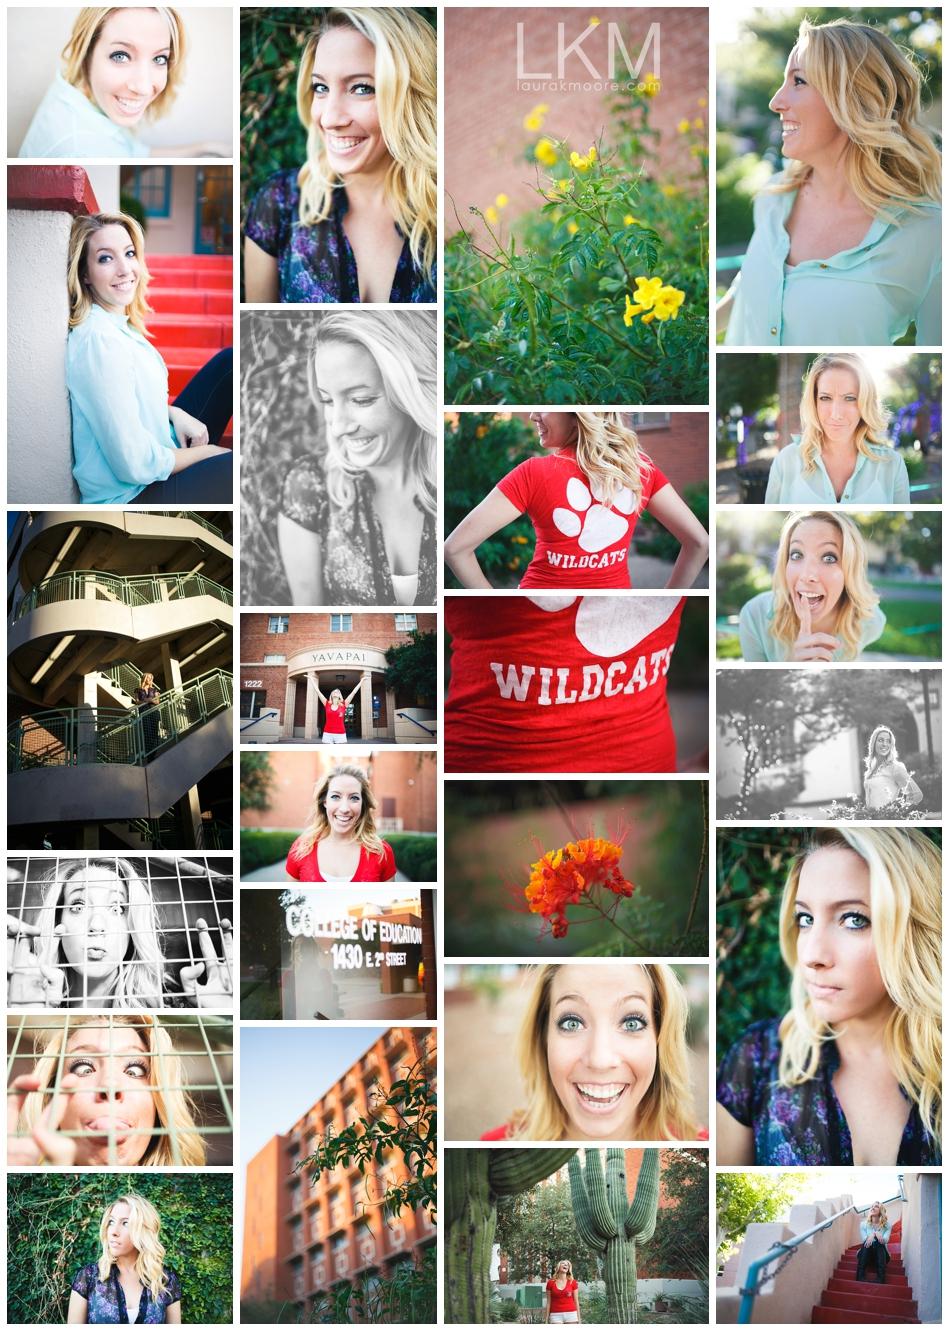 university-of-arizona-senior-portrait-session-laura-k-moore-photography.jpg